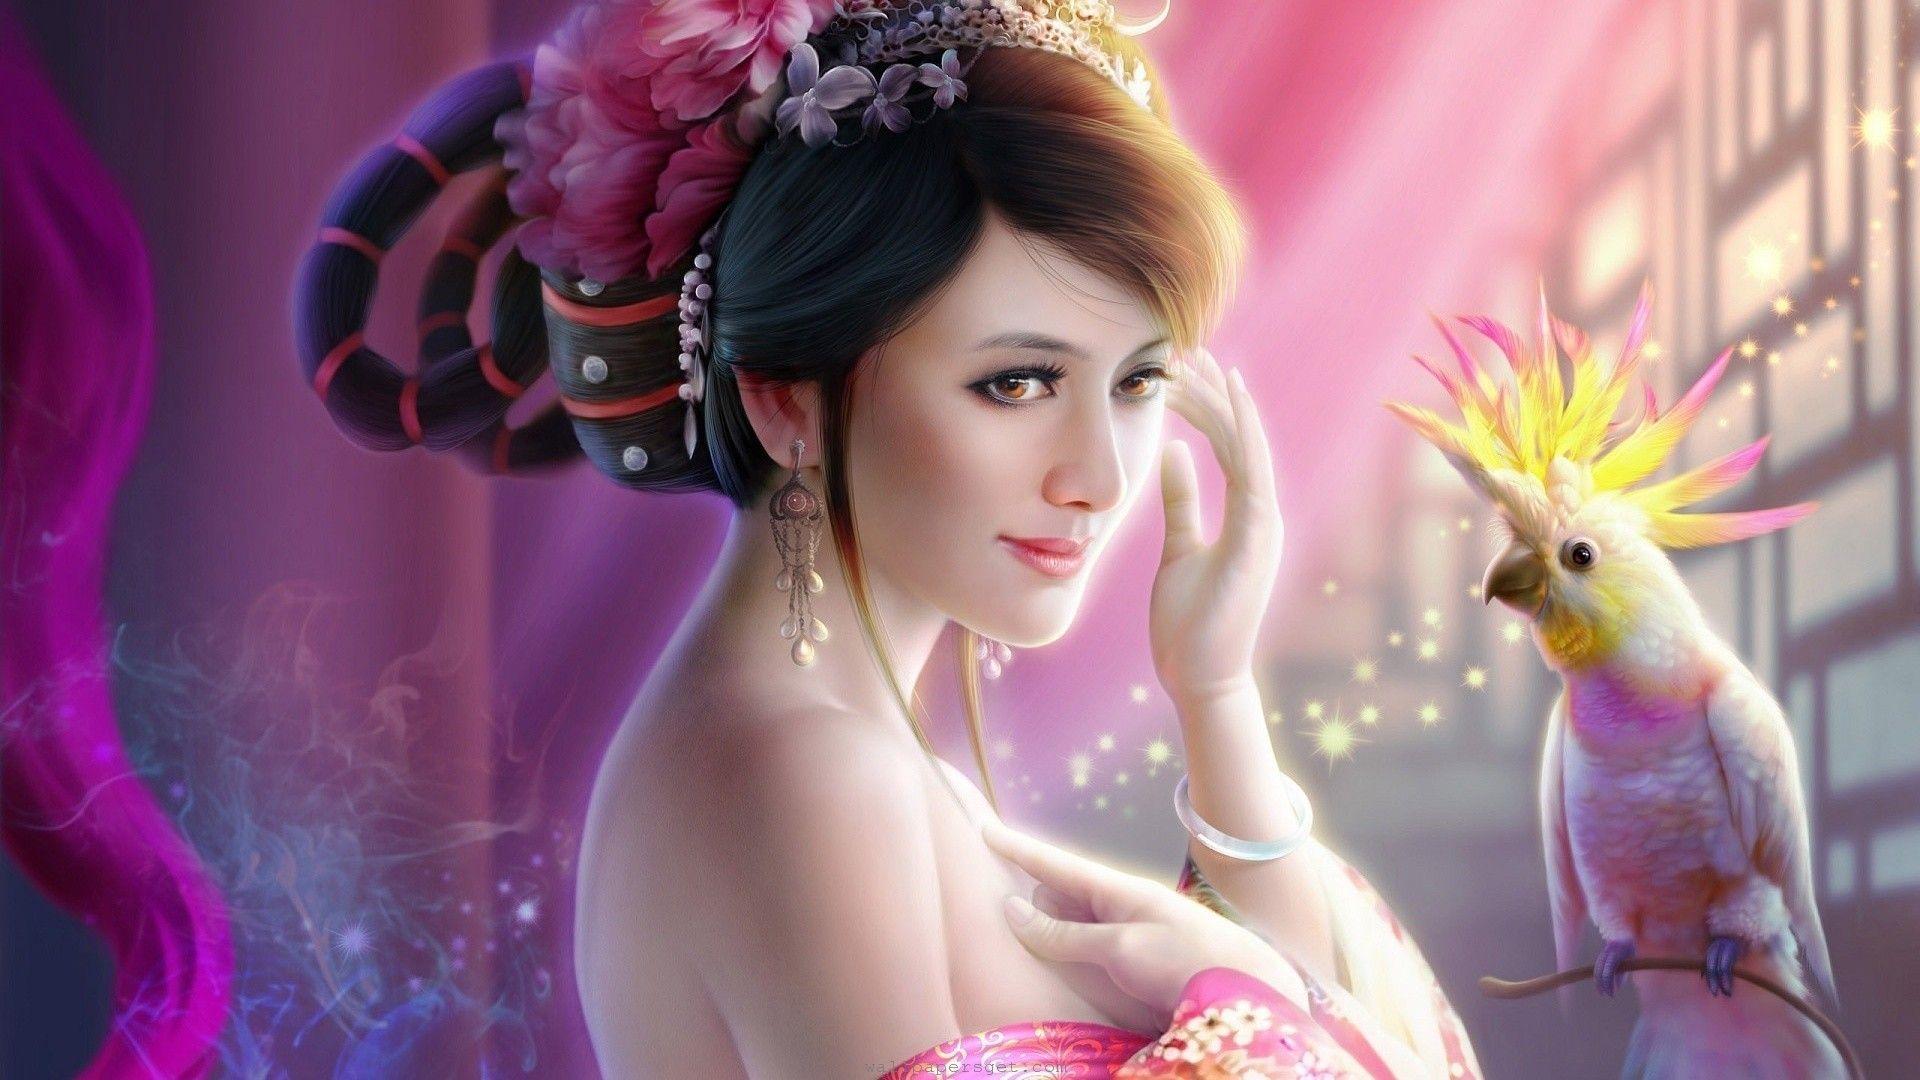 Fantasy Girl Hd Wallpapers Fantasy Princess Fantasy Girl Art Girl